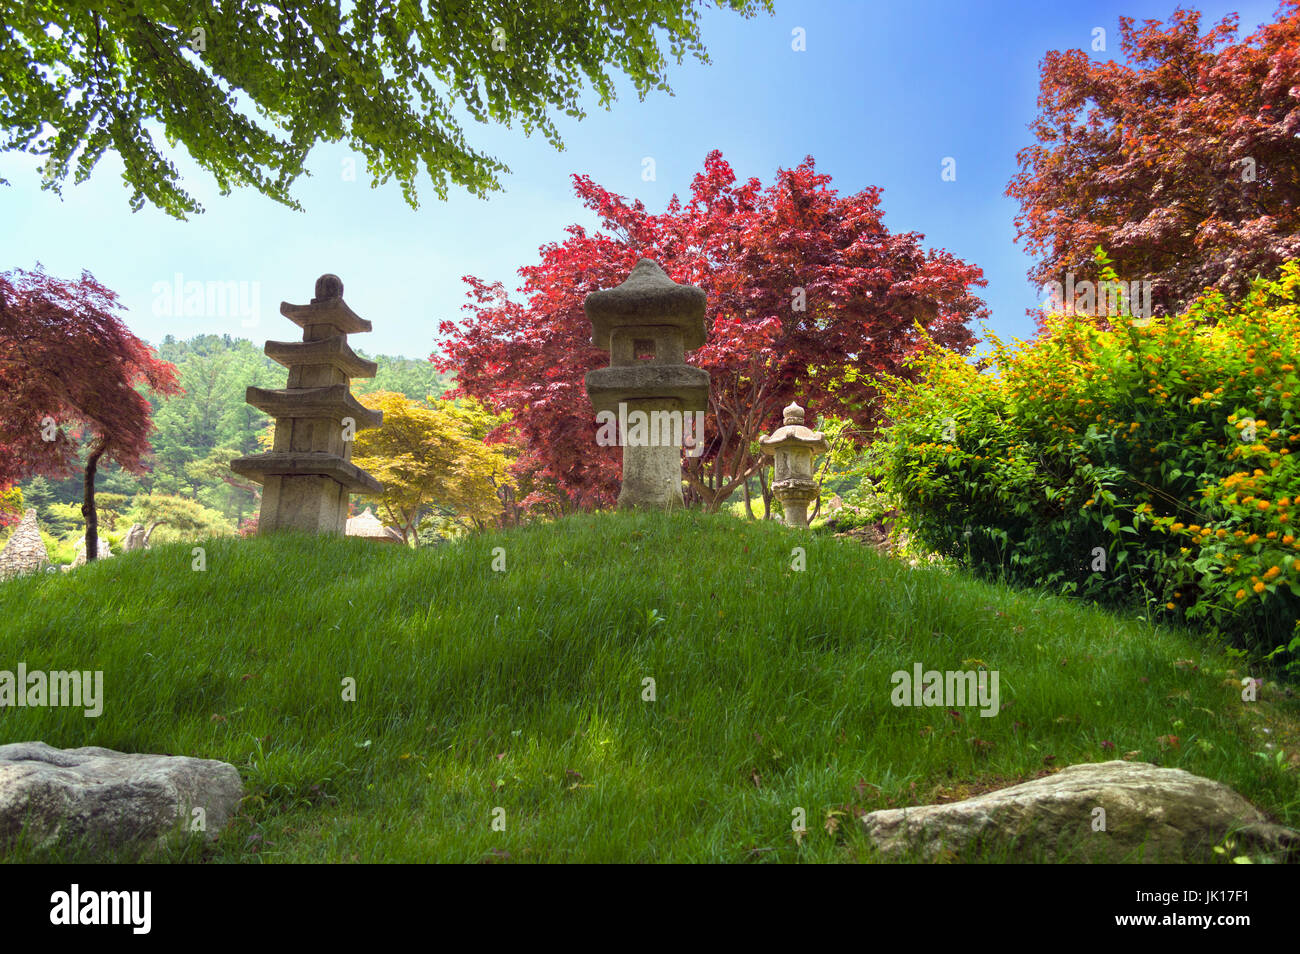 traditional korean garden with stone sculptures - Stock Image